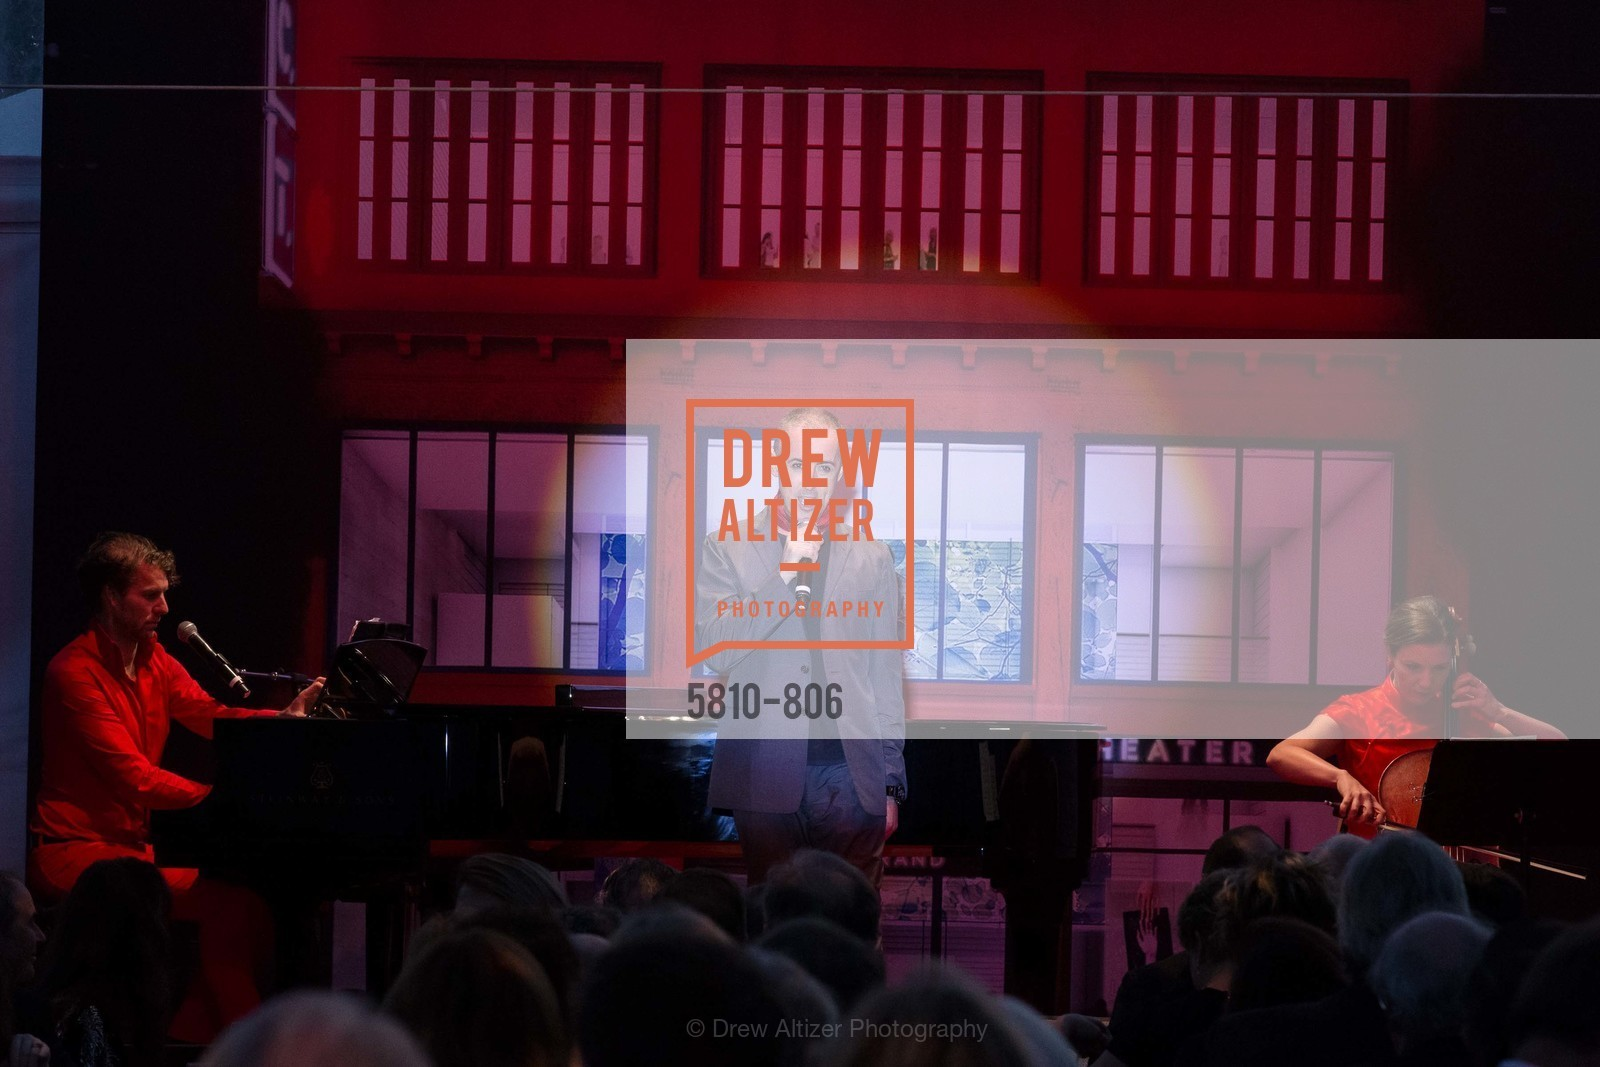 Performance By Alan Cumming, Photo #5810-806